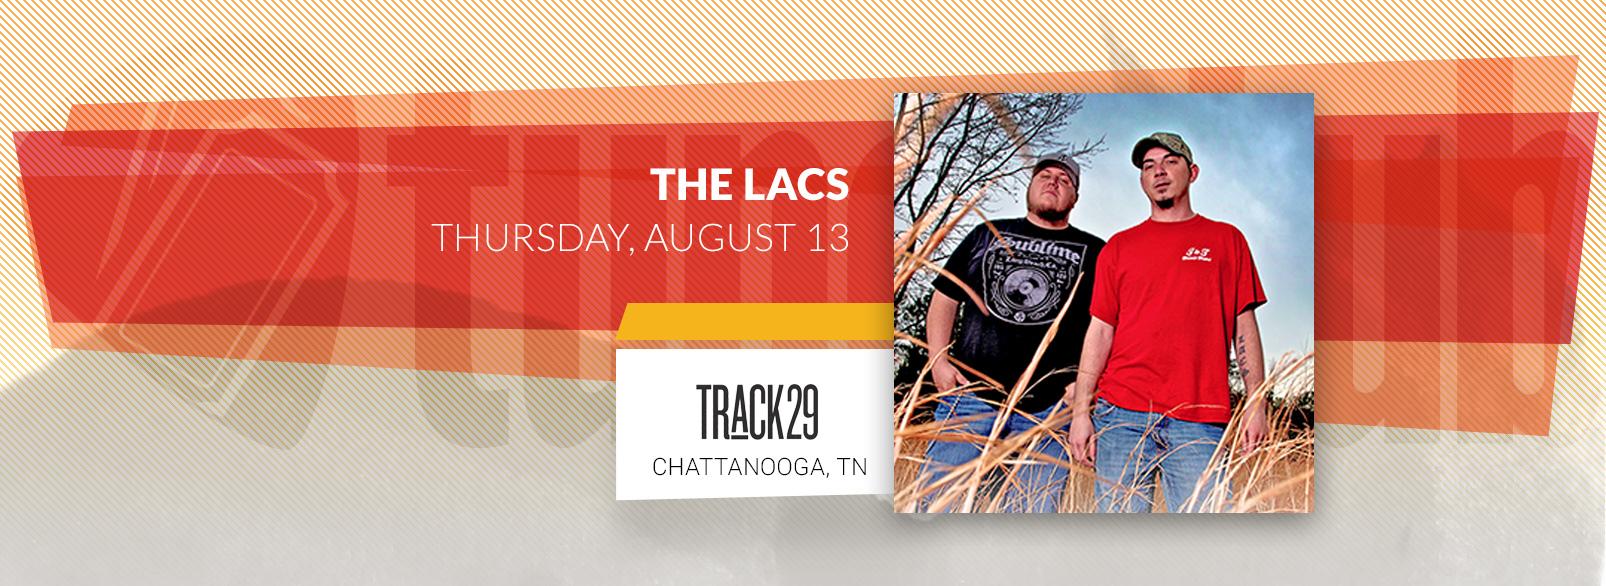 The Lacs @ Track 29